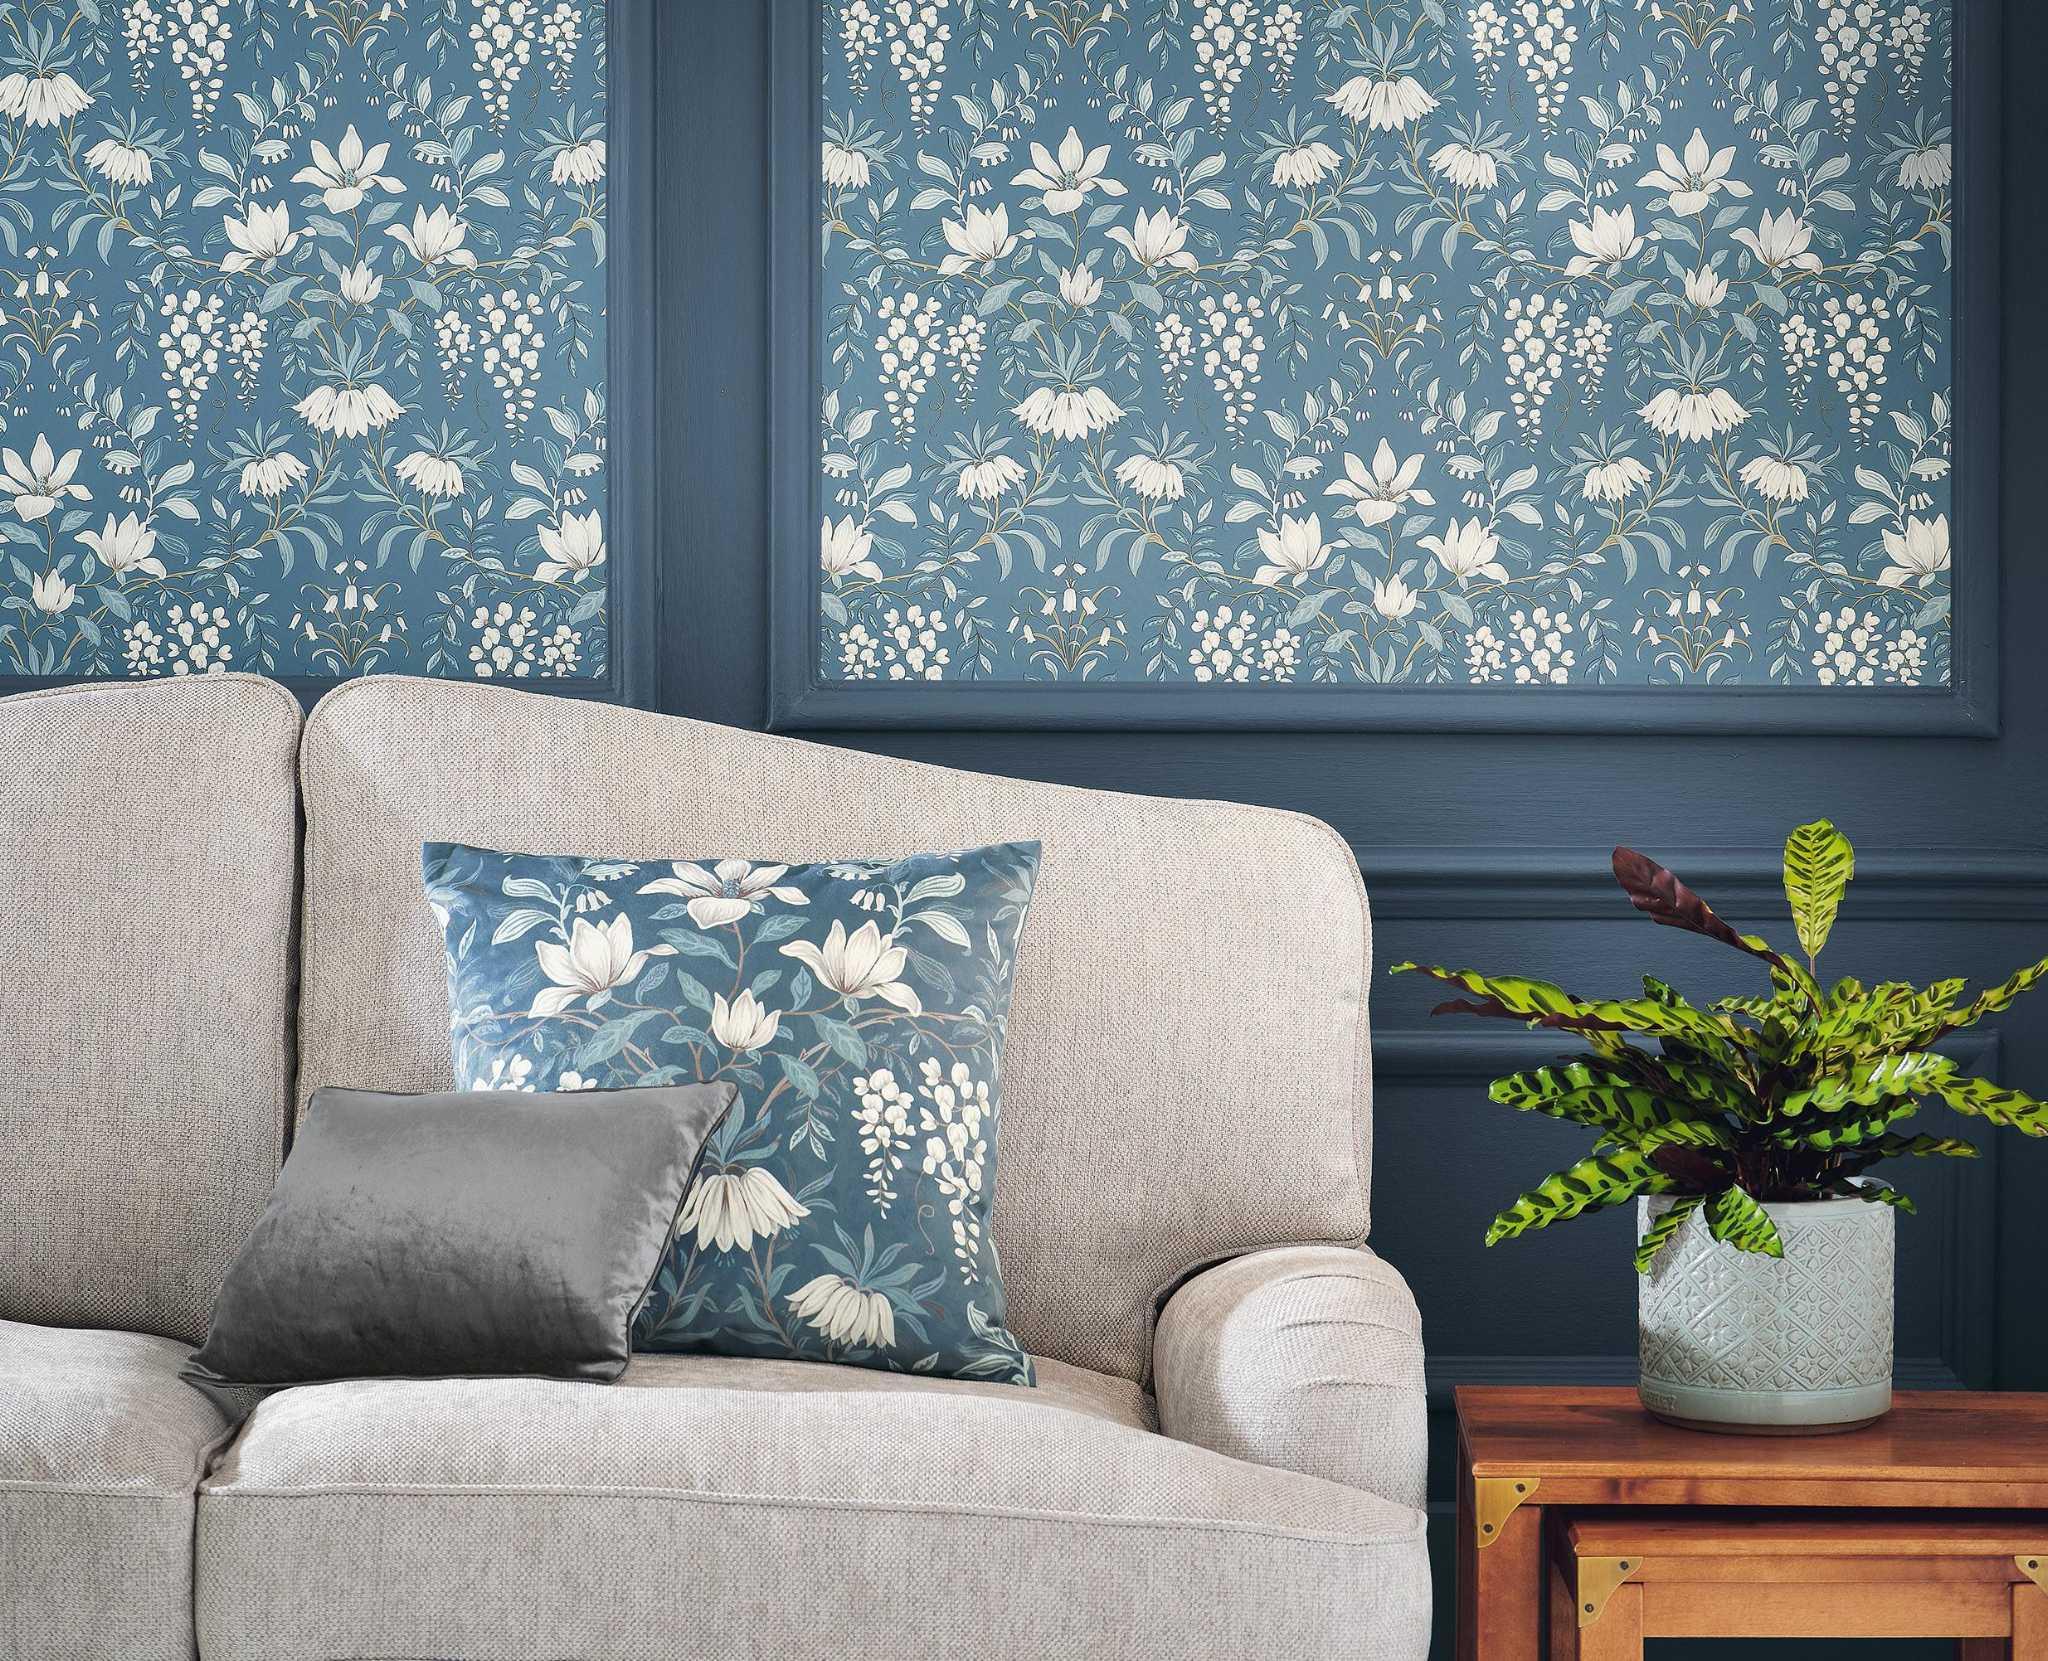 What's new? Spring brings fresh home décor ideas